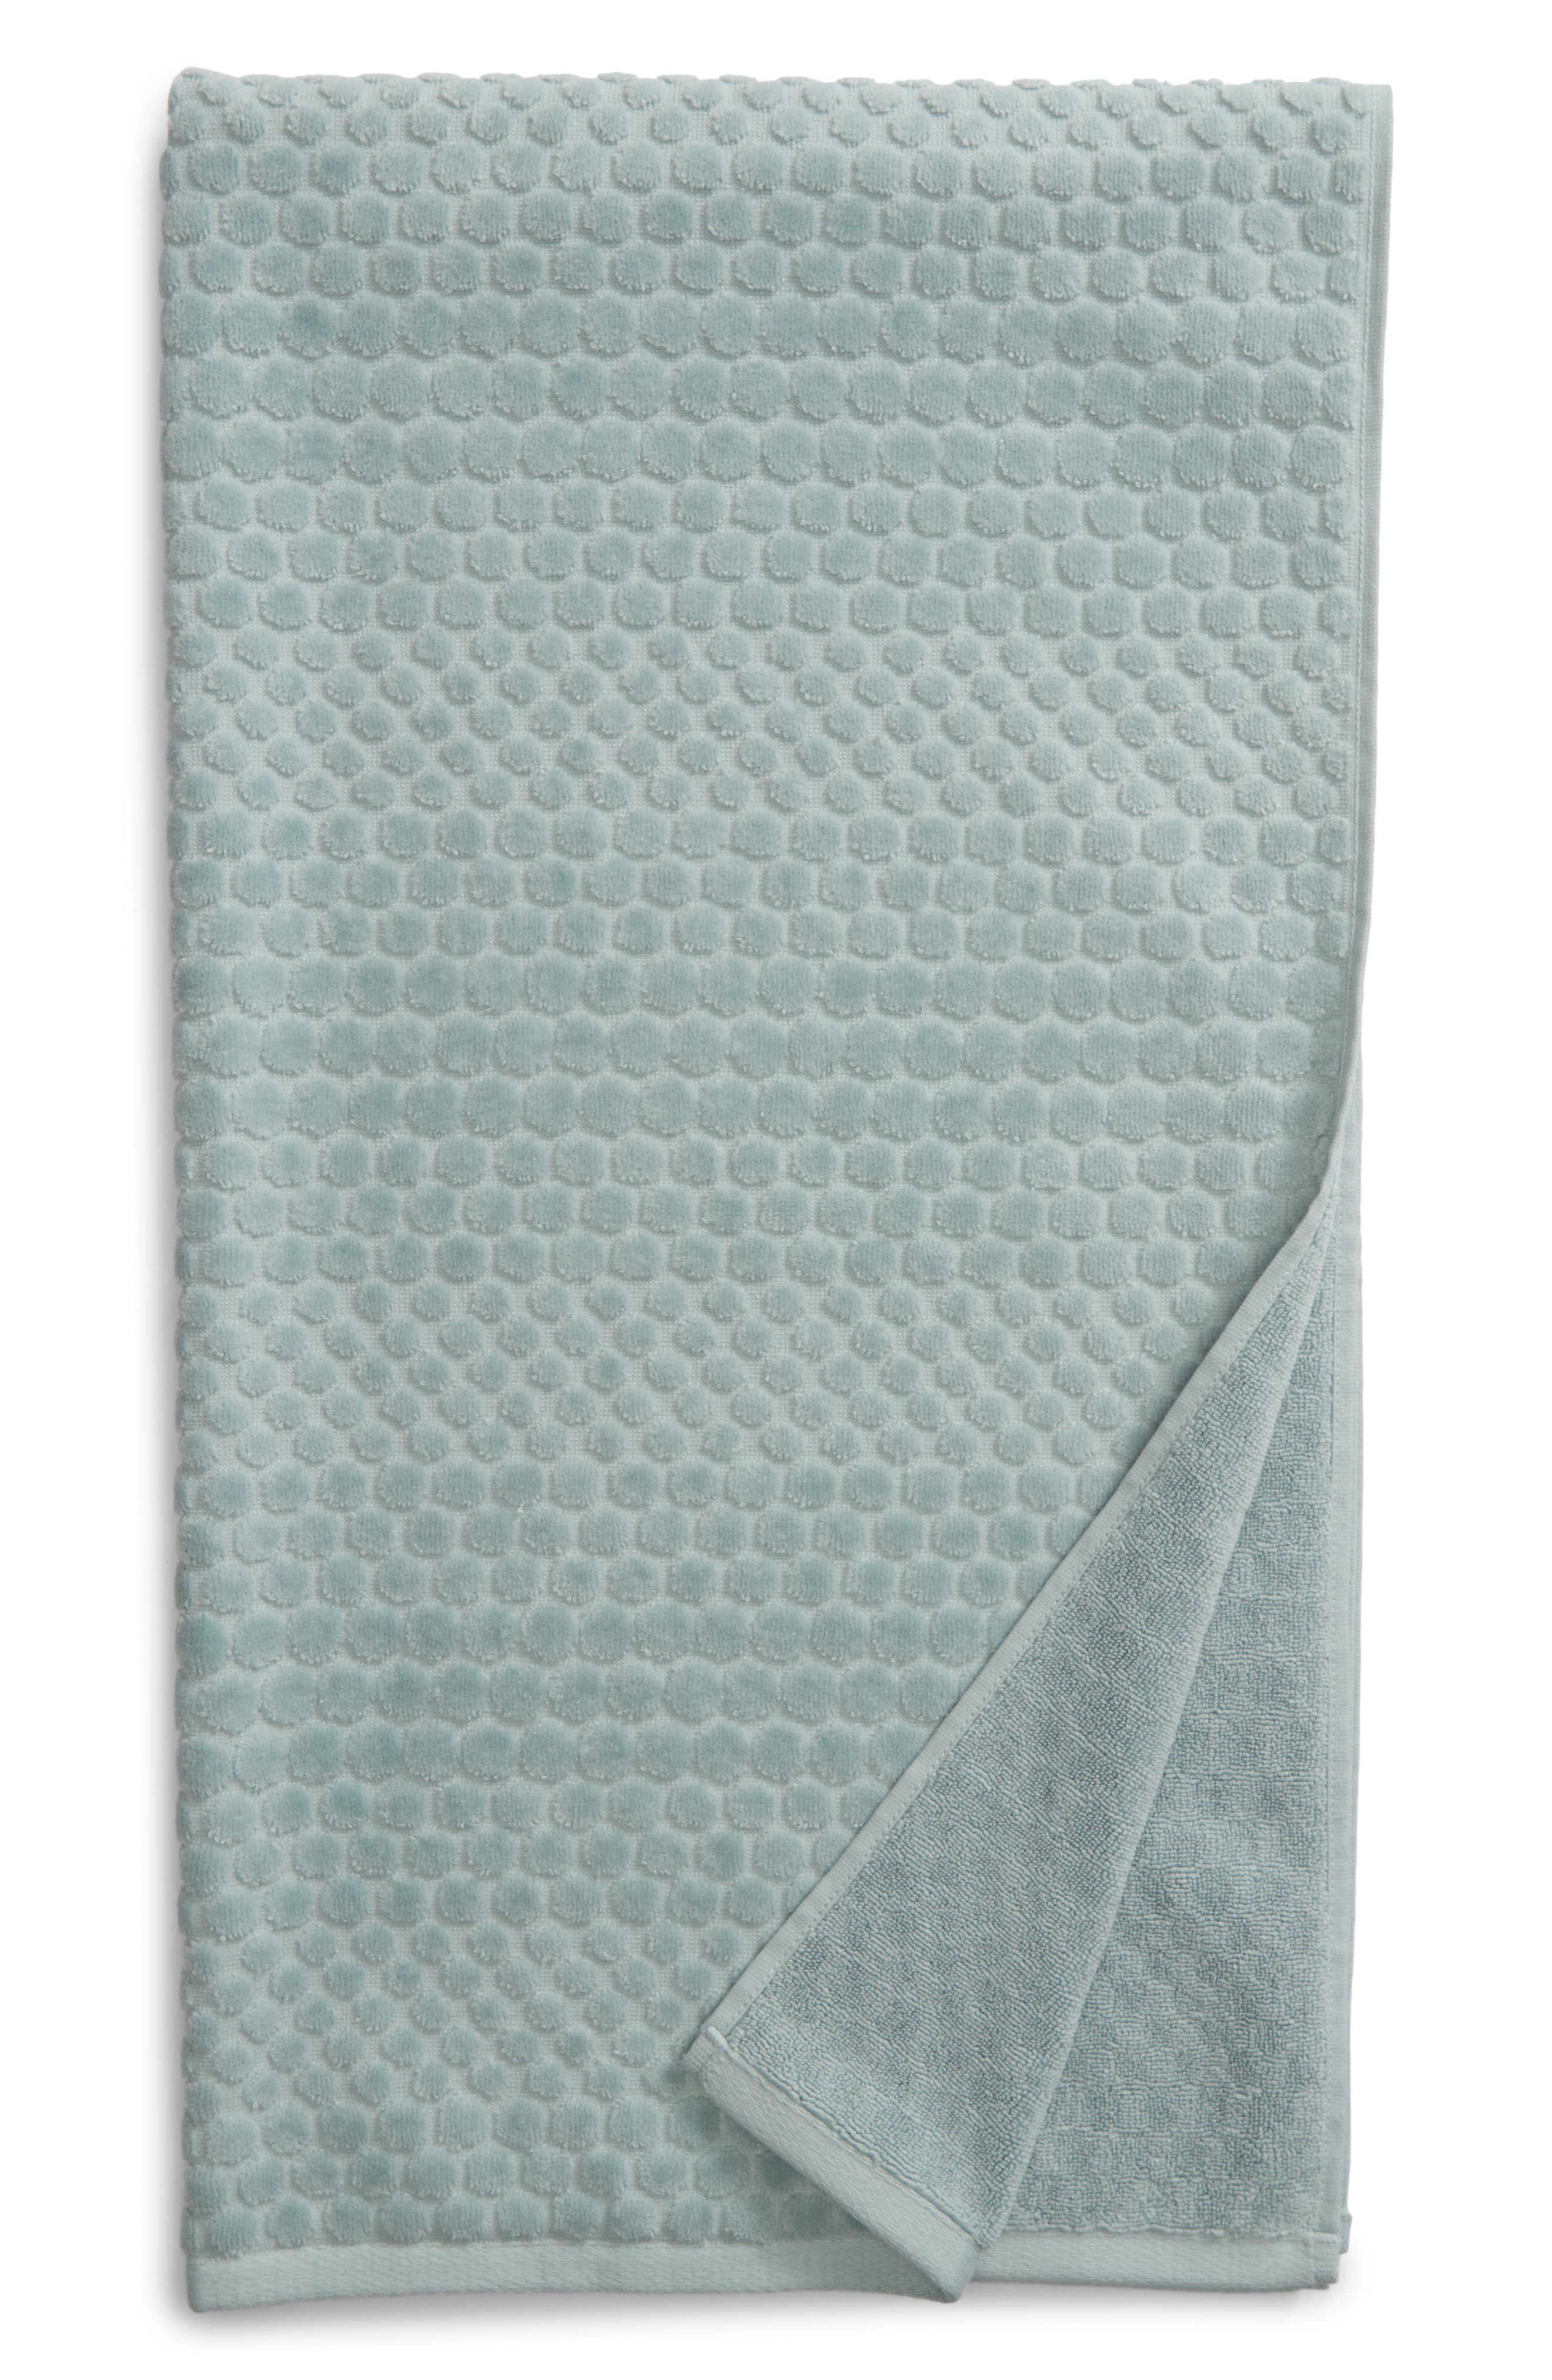 Nordstrom at Home Lorenza Bath Towel